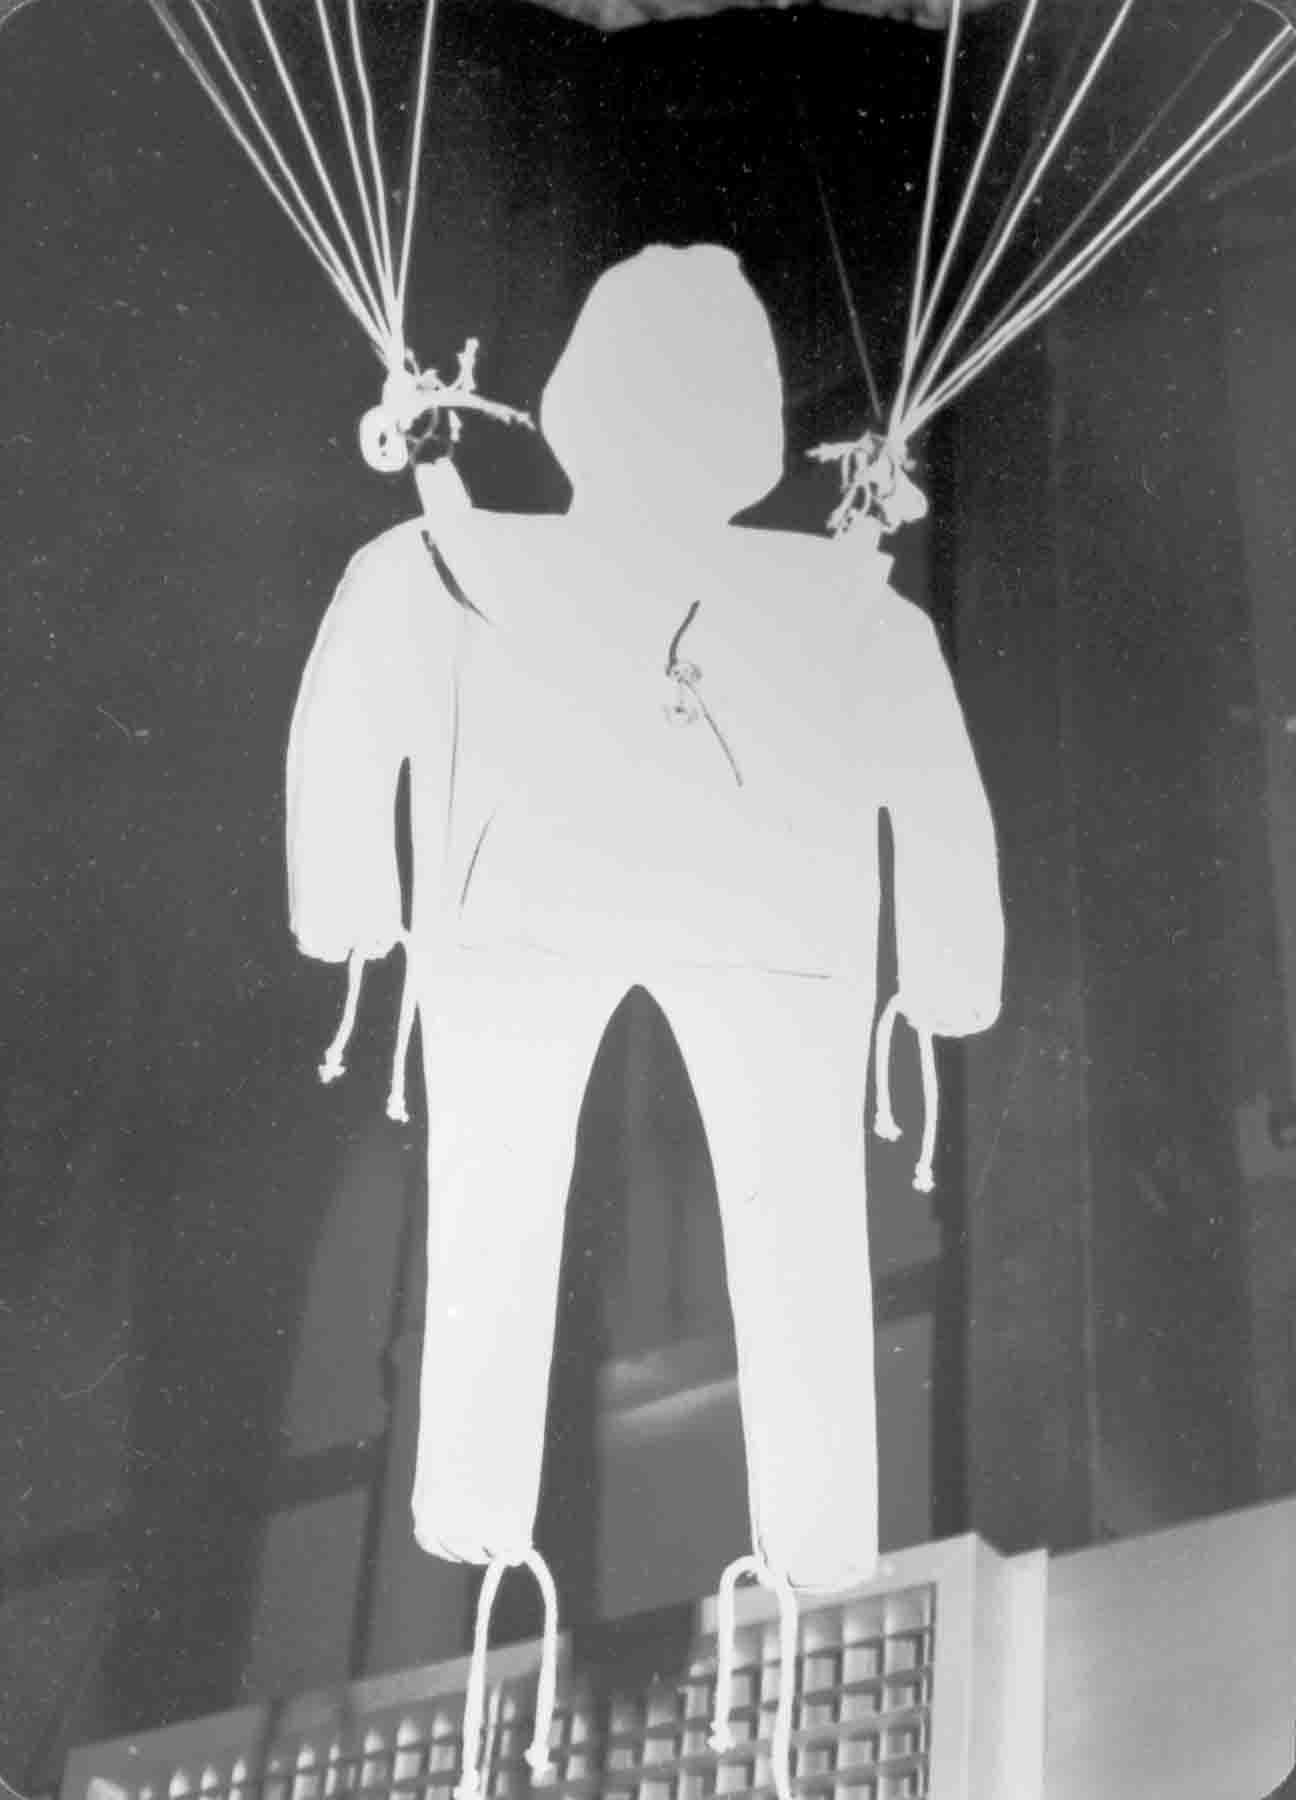 Paratrooper Rupert